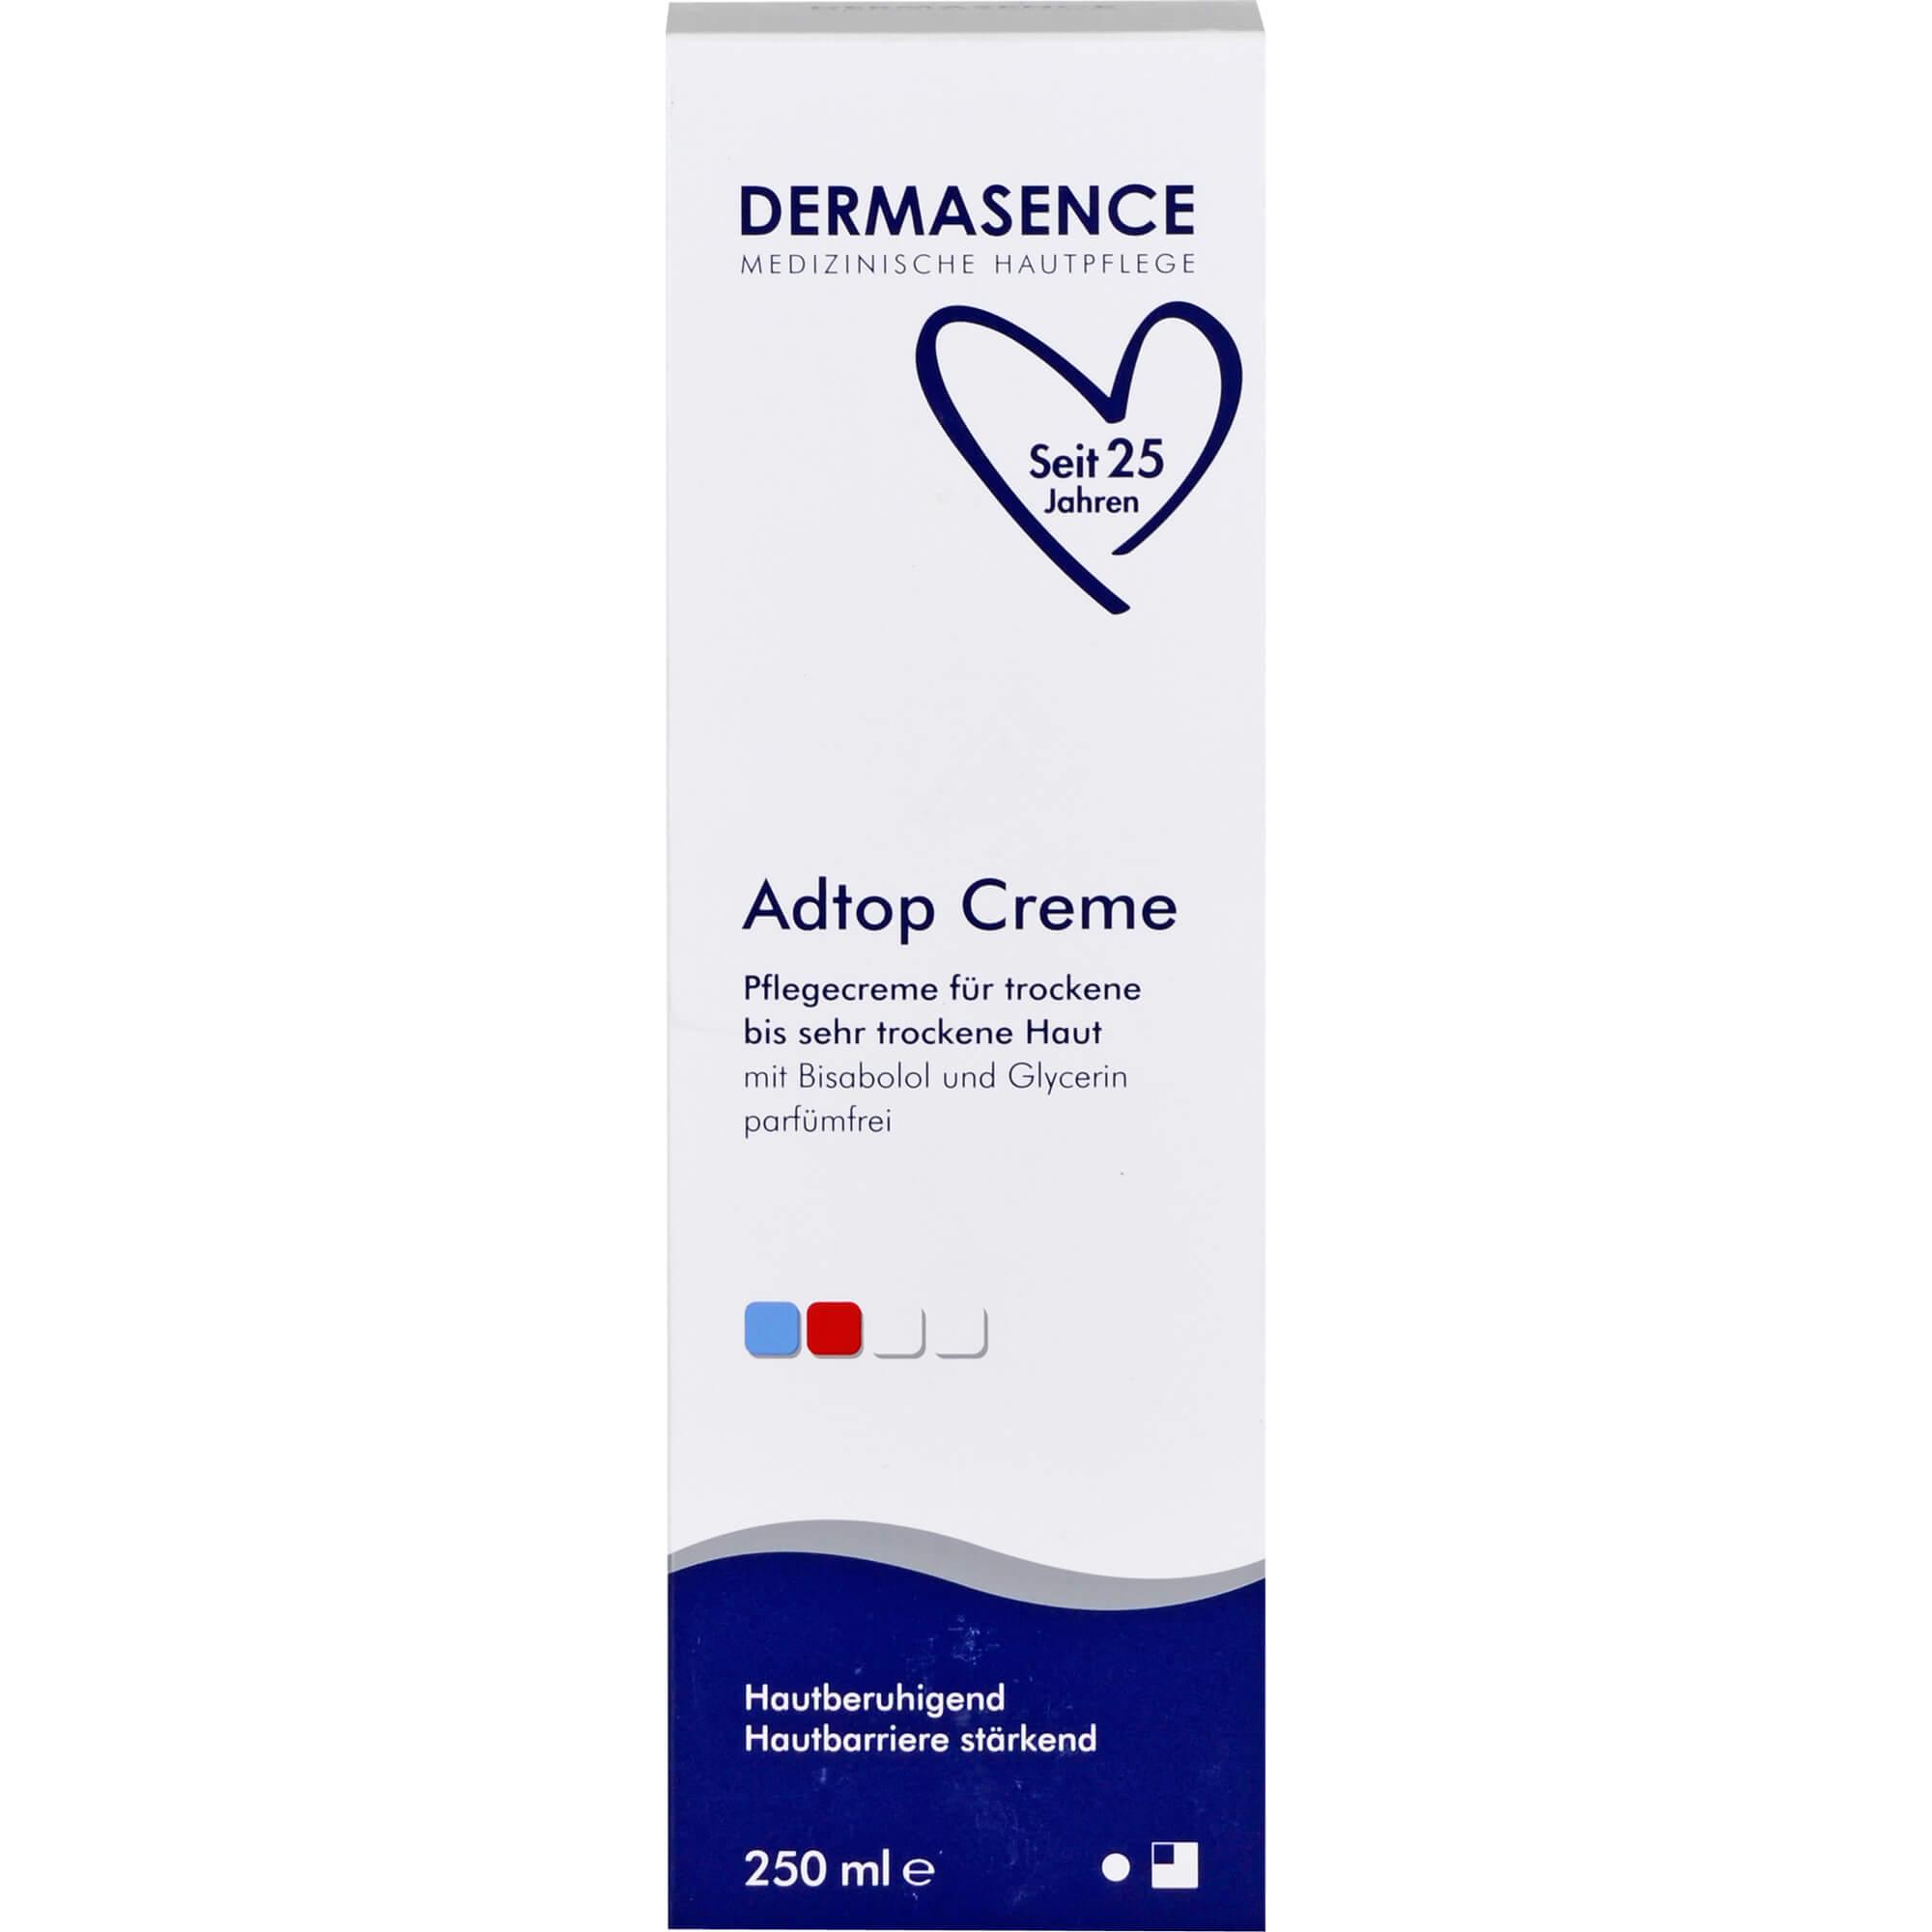 DERMASENCE-Adtop-Creme